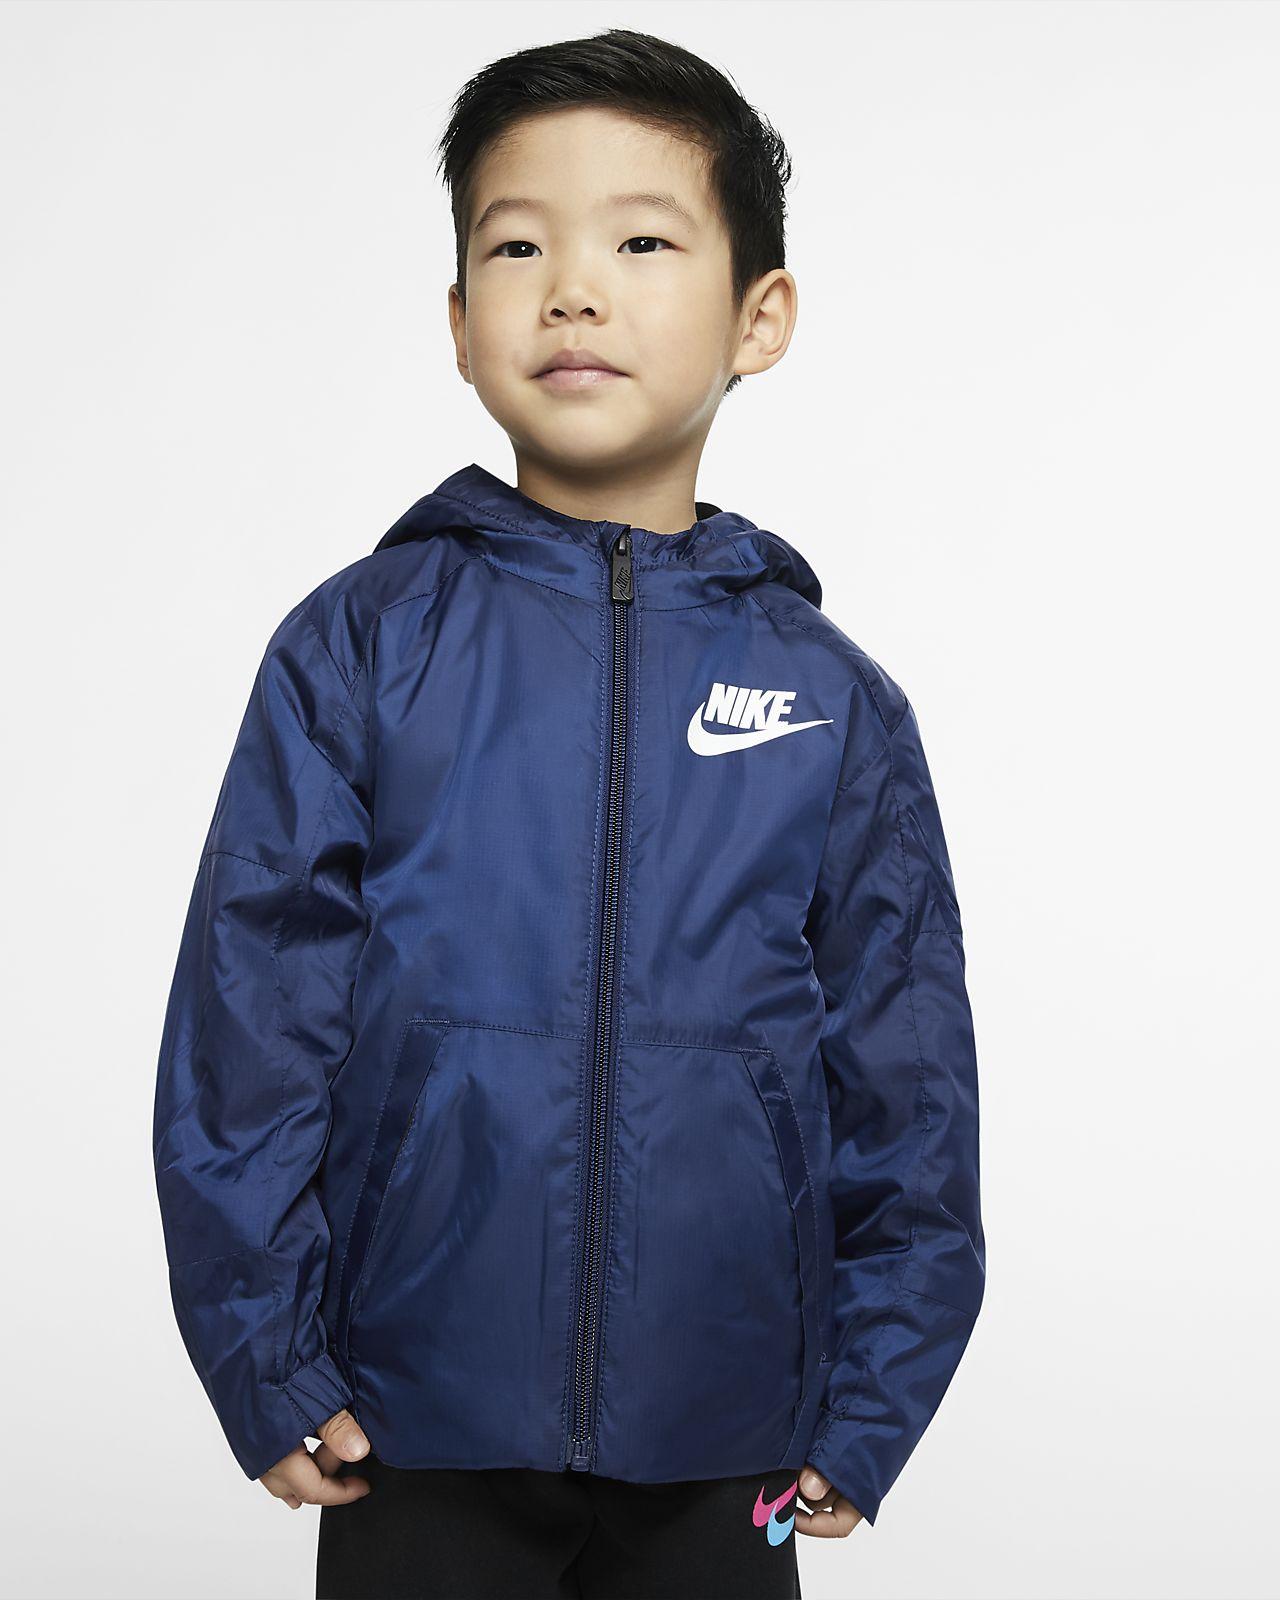 Nike Sportswear Jaqueta amb cremallera completa - Infant